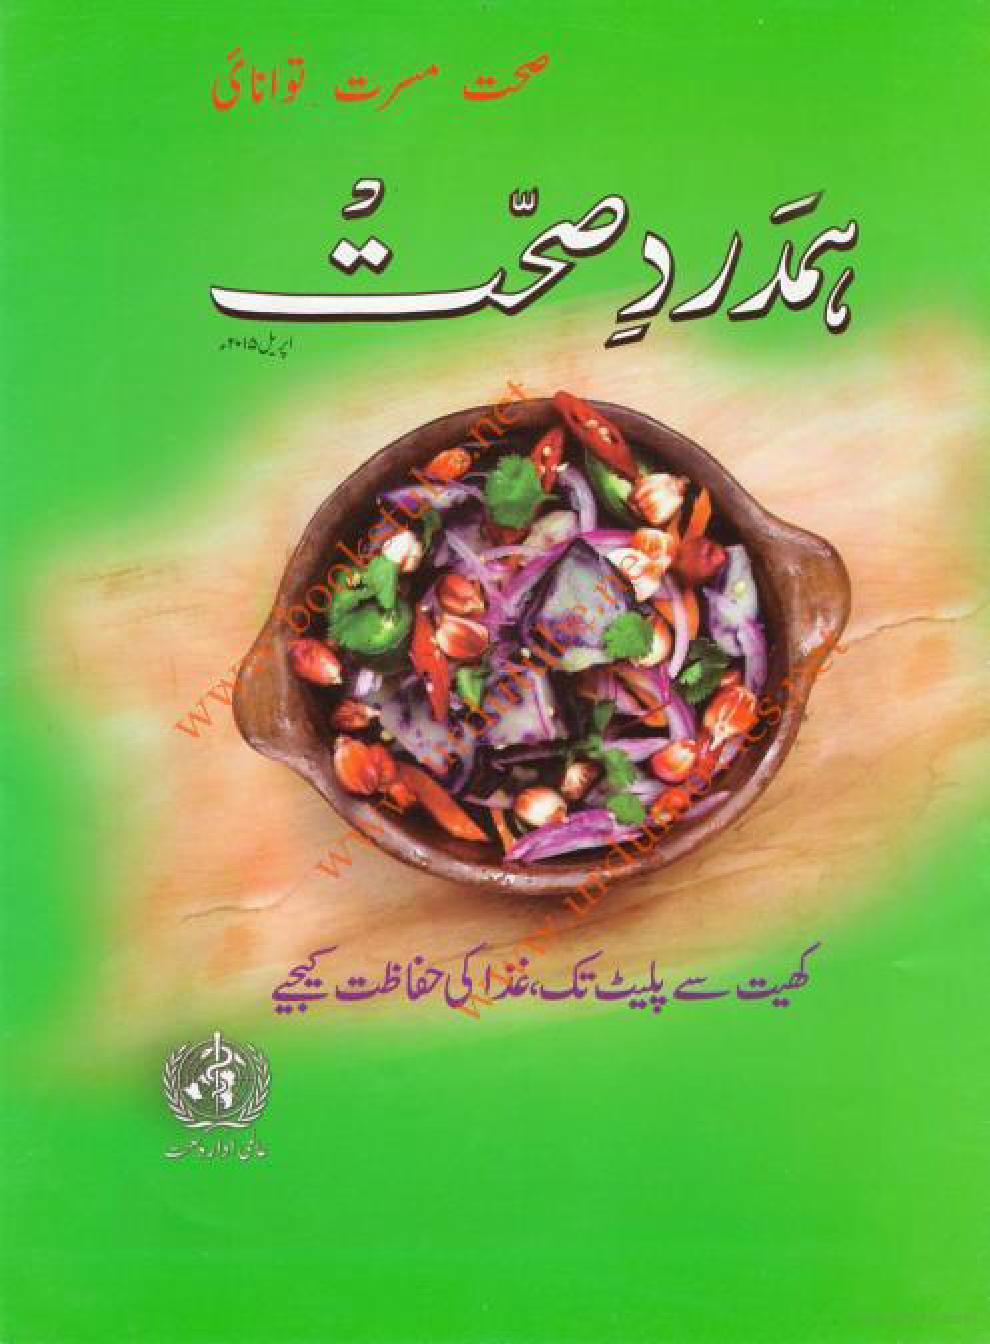 http://www.mediafire.com/view/gt4pltv2u2wjpg9/hamdardsehatapril2015bybookstube.net.pdf